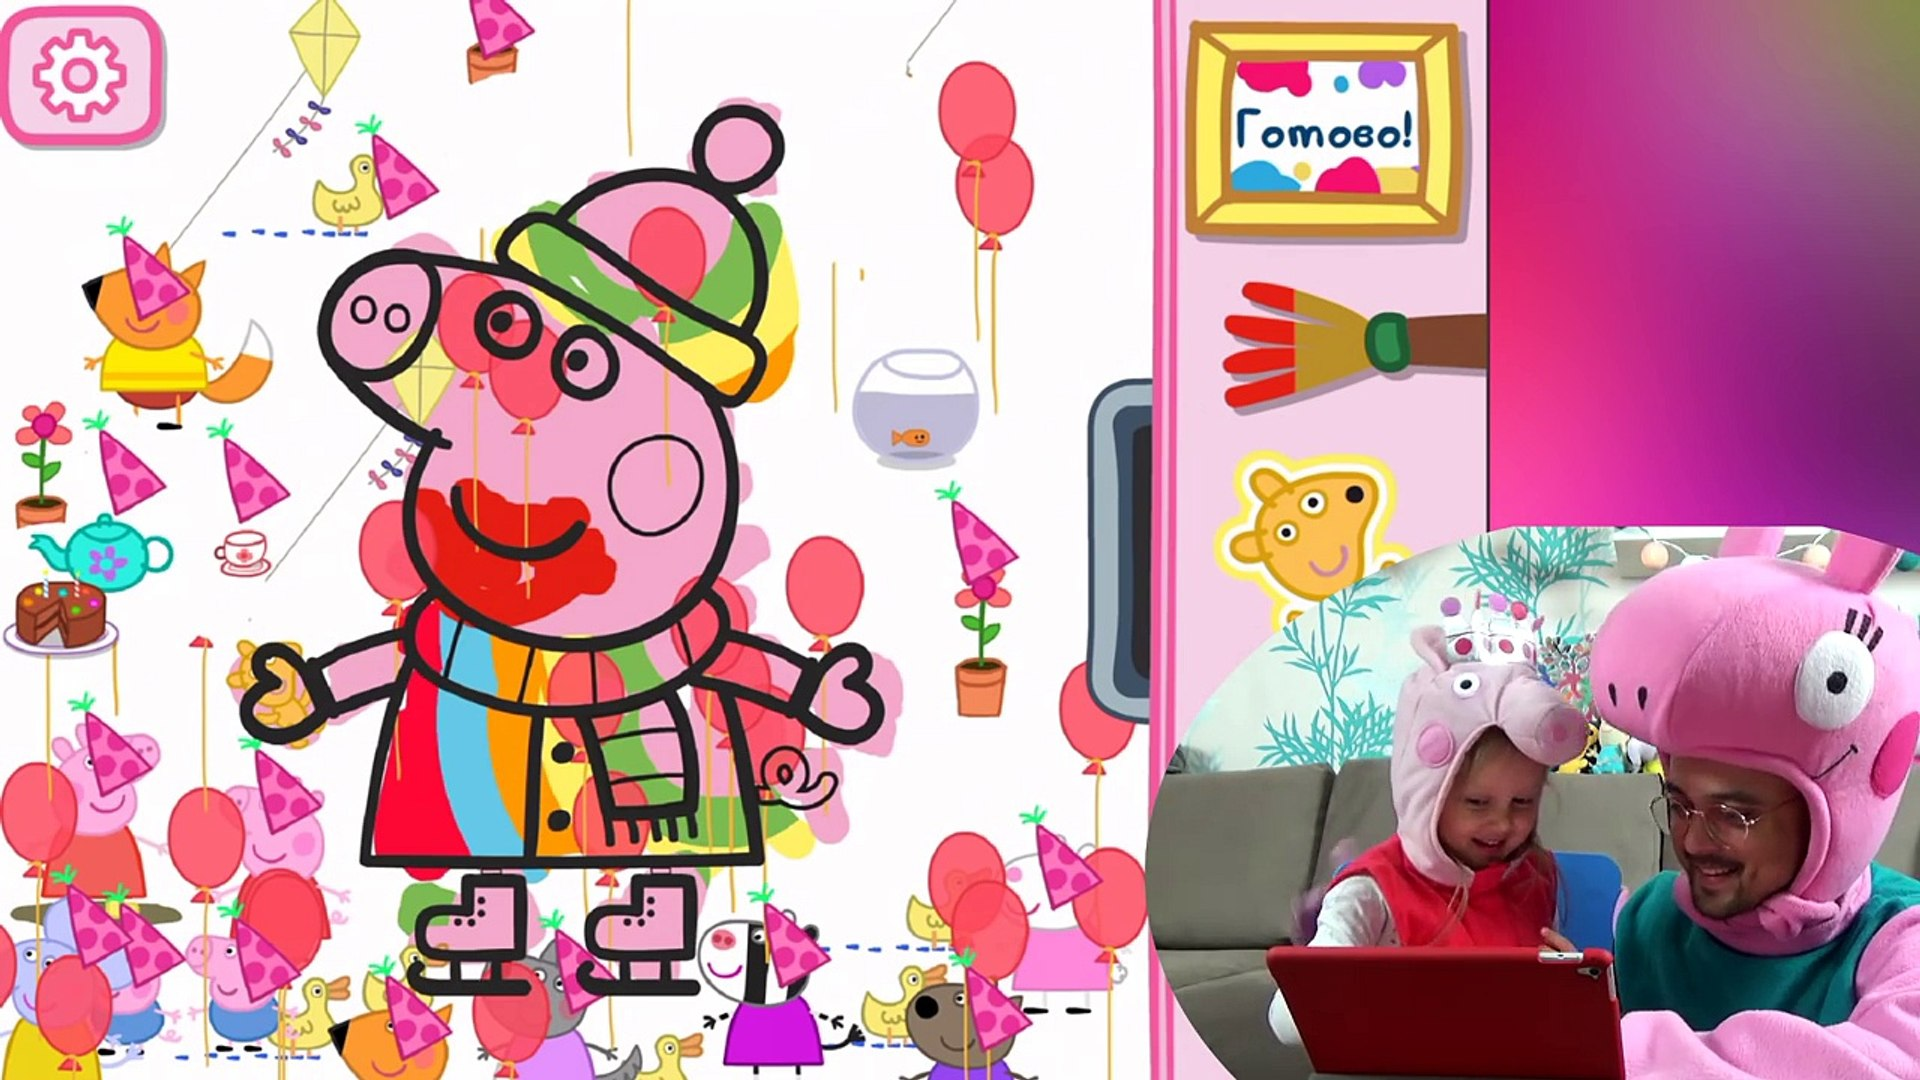 СВИНКА ПЕППА Раскраска для детей Игры на планшете Lets Play Рисуем с Peppa pig Drawing